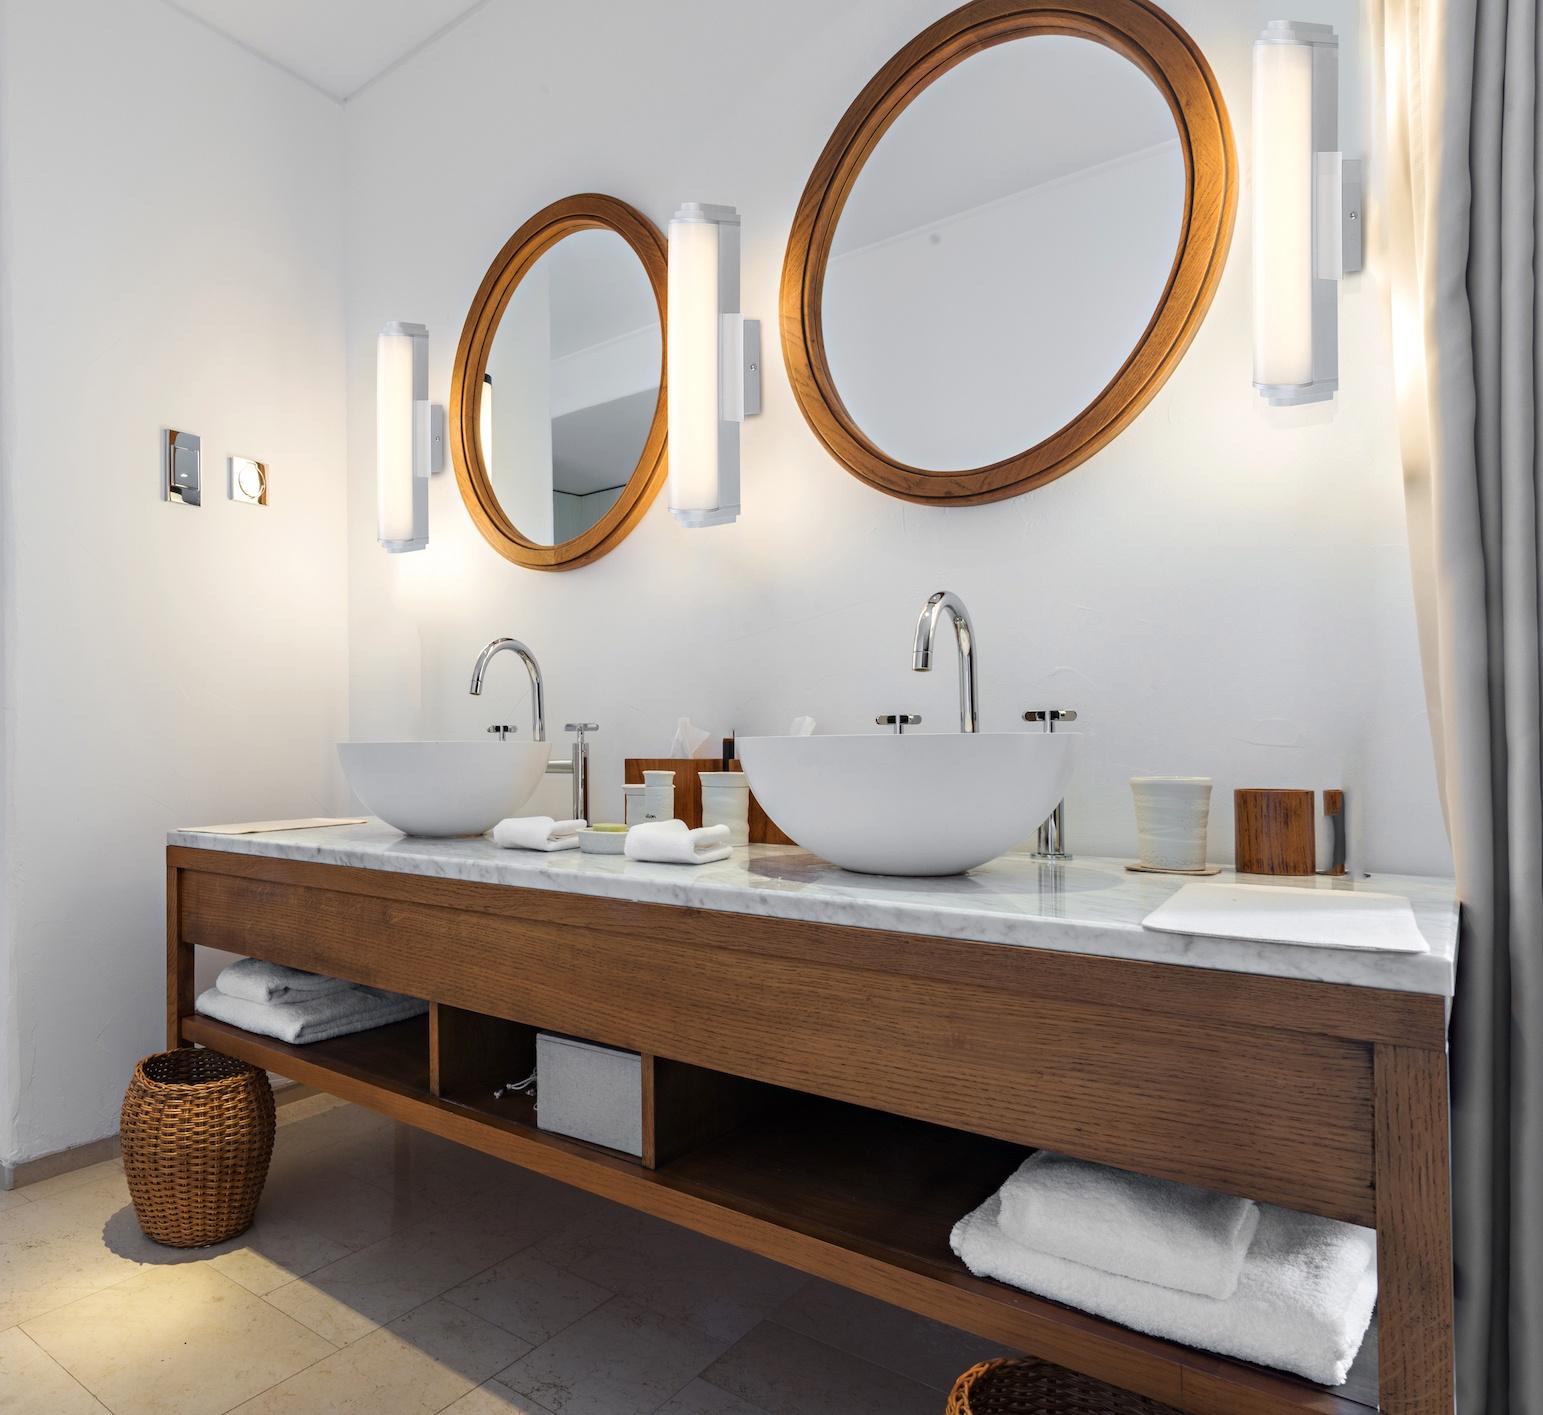 Ways To Achieve Your Best Bathroom Lighting - Best way to light a bathroom